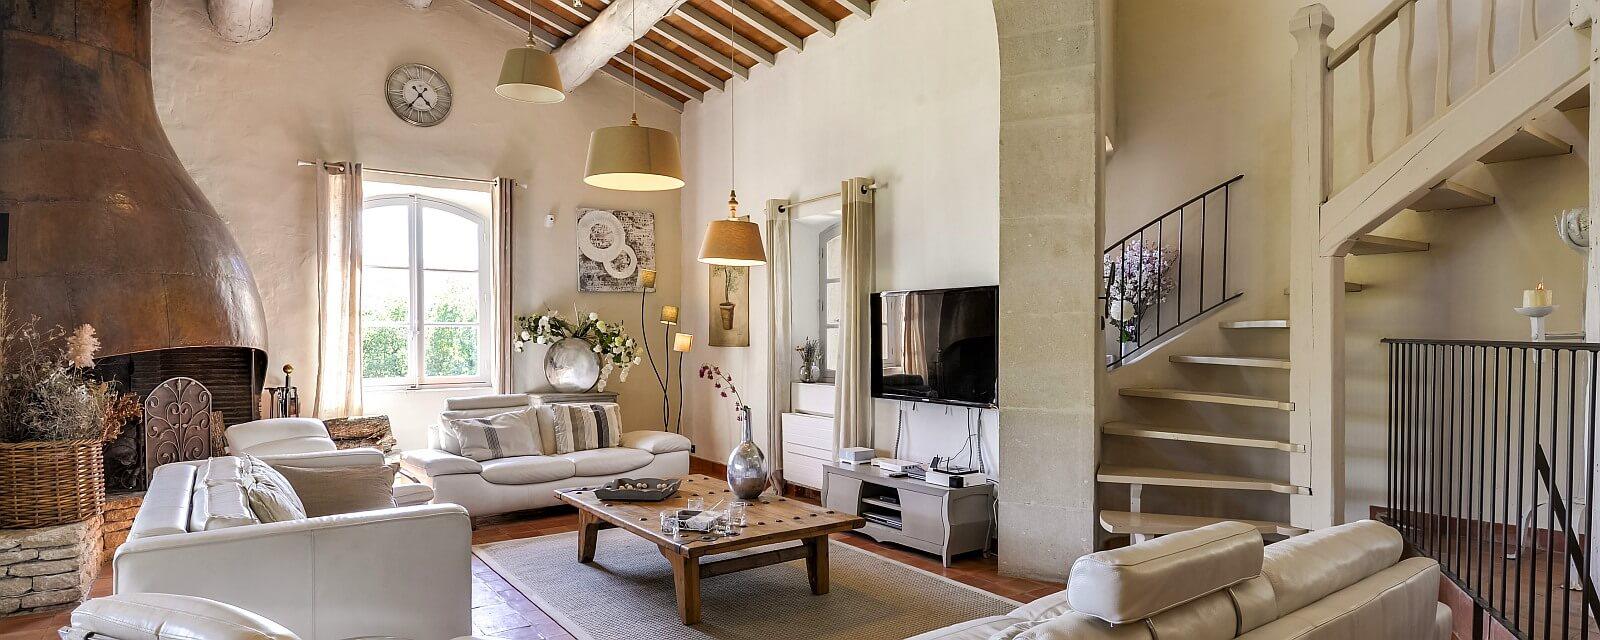 LE MAS BUIS | Luxus Ferienhaus Provence | bei LANDMARK mieten